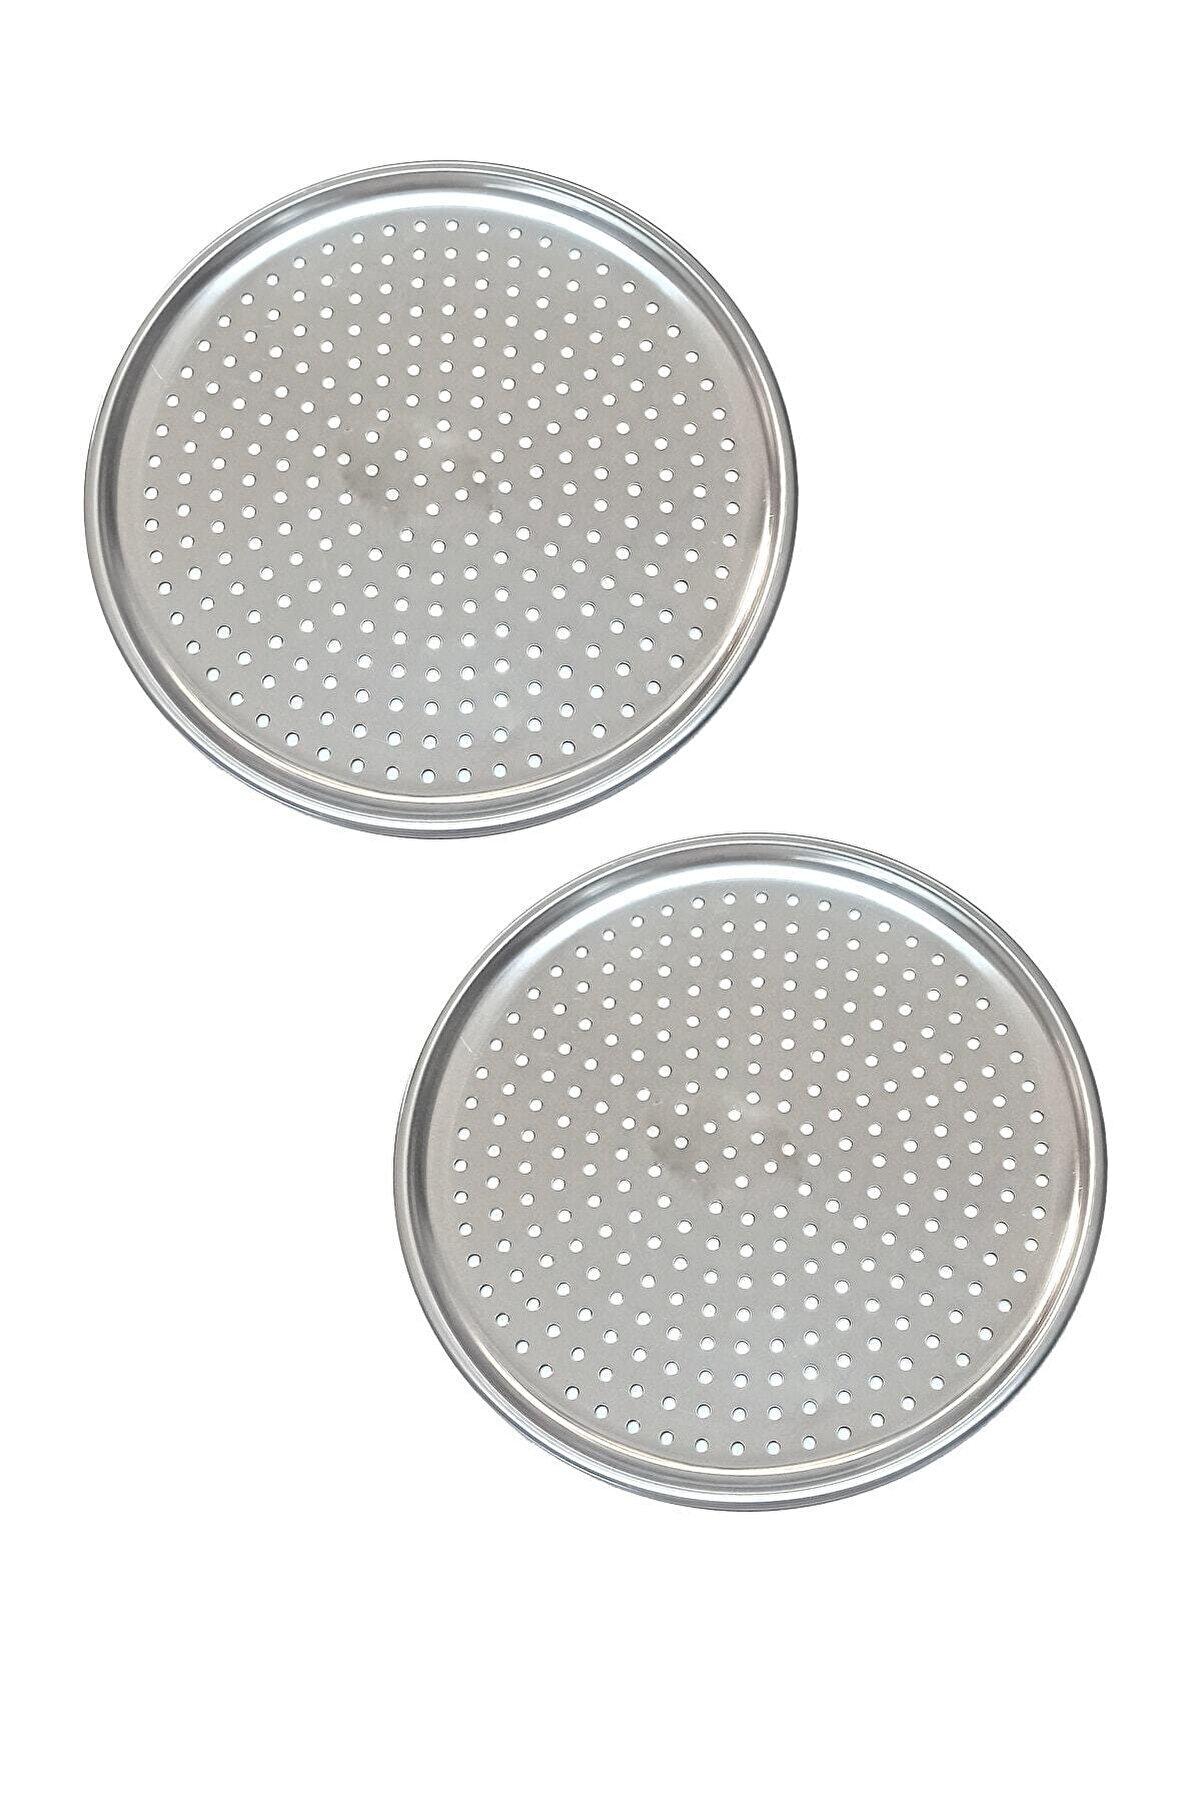 Vipkitchen 2'li Çelik Lüx Delikli Pizza Tepsisi 24 Cm